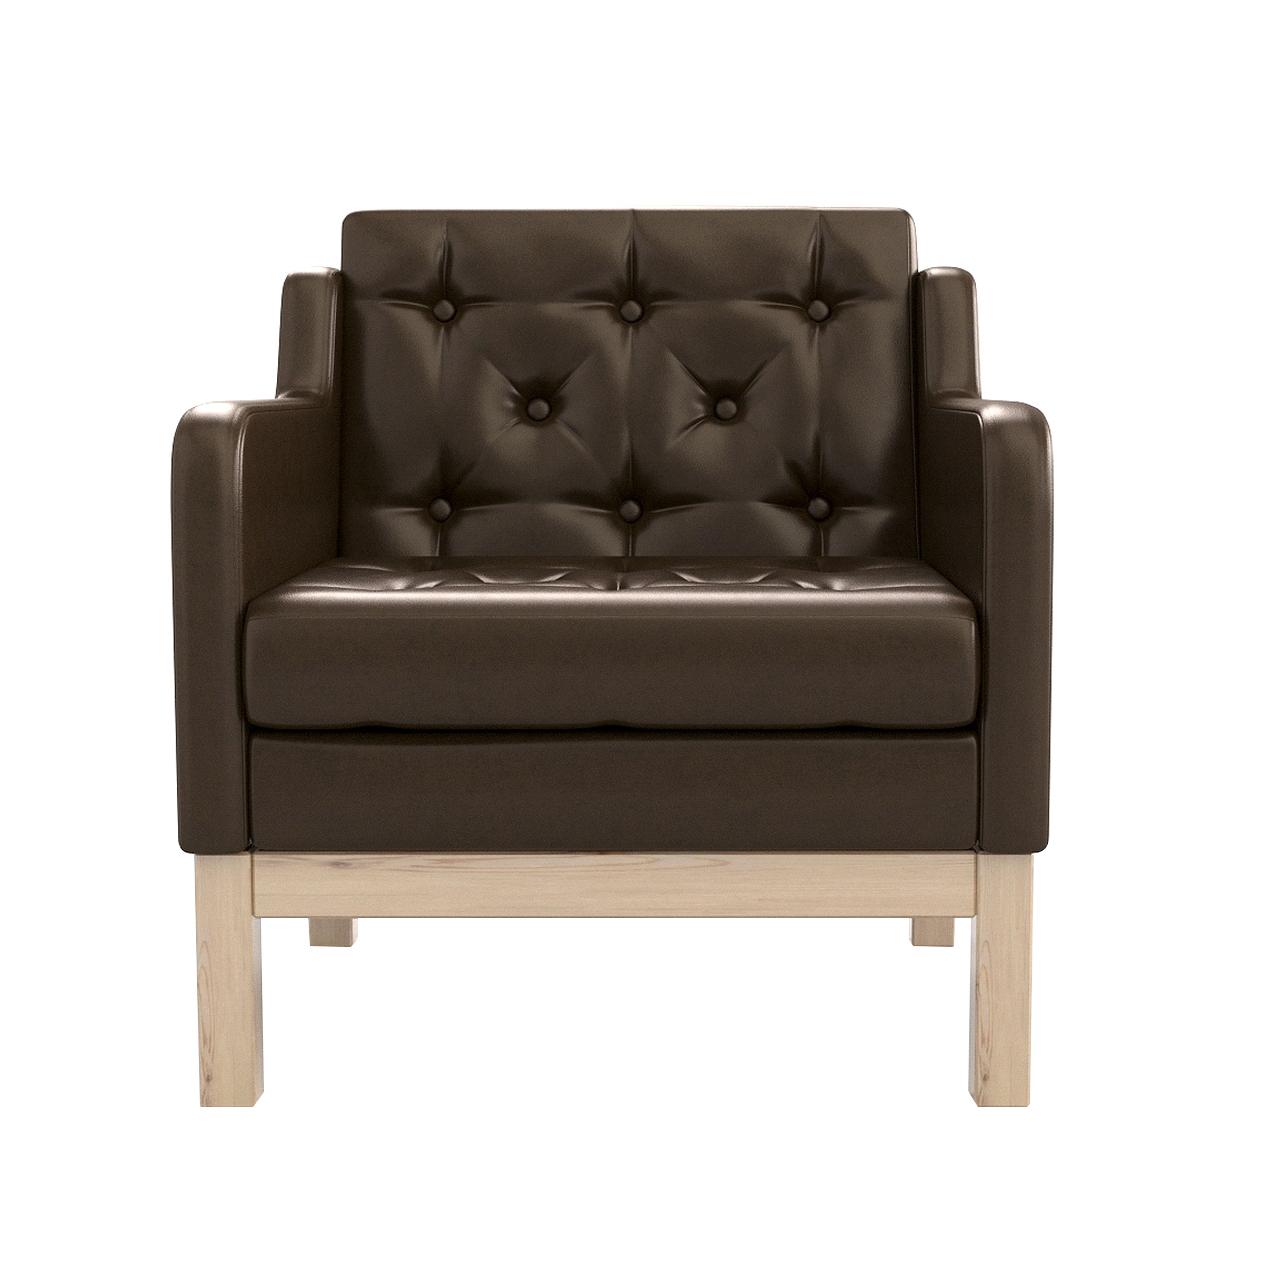 Фото - Кресло AS Алана 75.5x82x83 сосна/коричневый диван as алана м 154x82x83 сосна коричневый